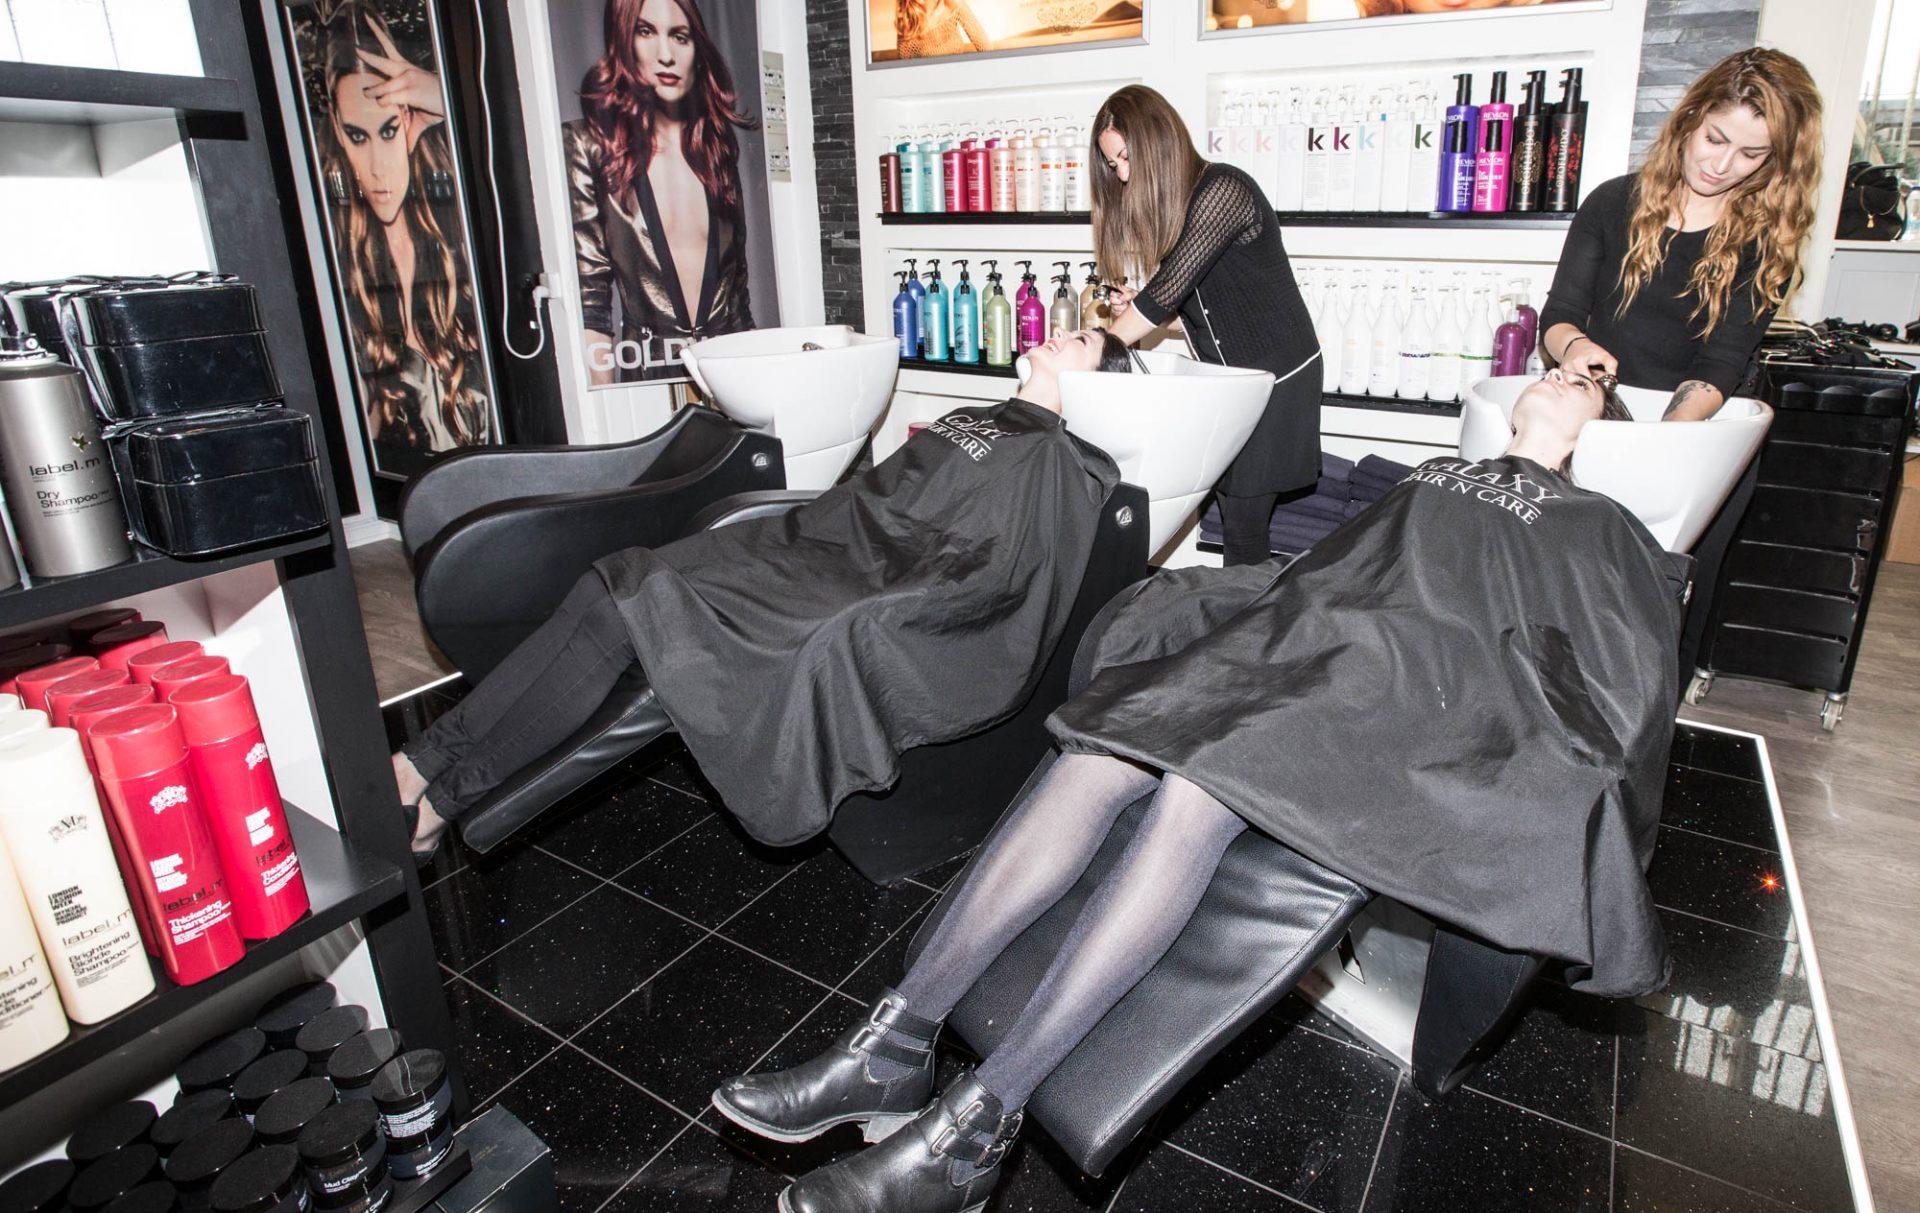 Frisørsalon Valby, Frederiksberg, Hvidovre, kunder ligger ned og får vasket håret